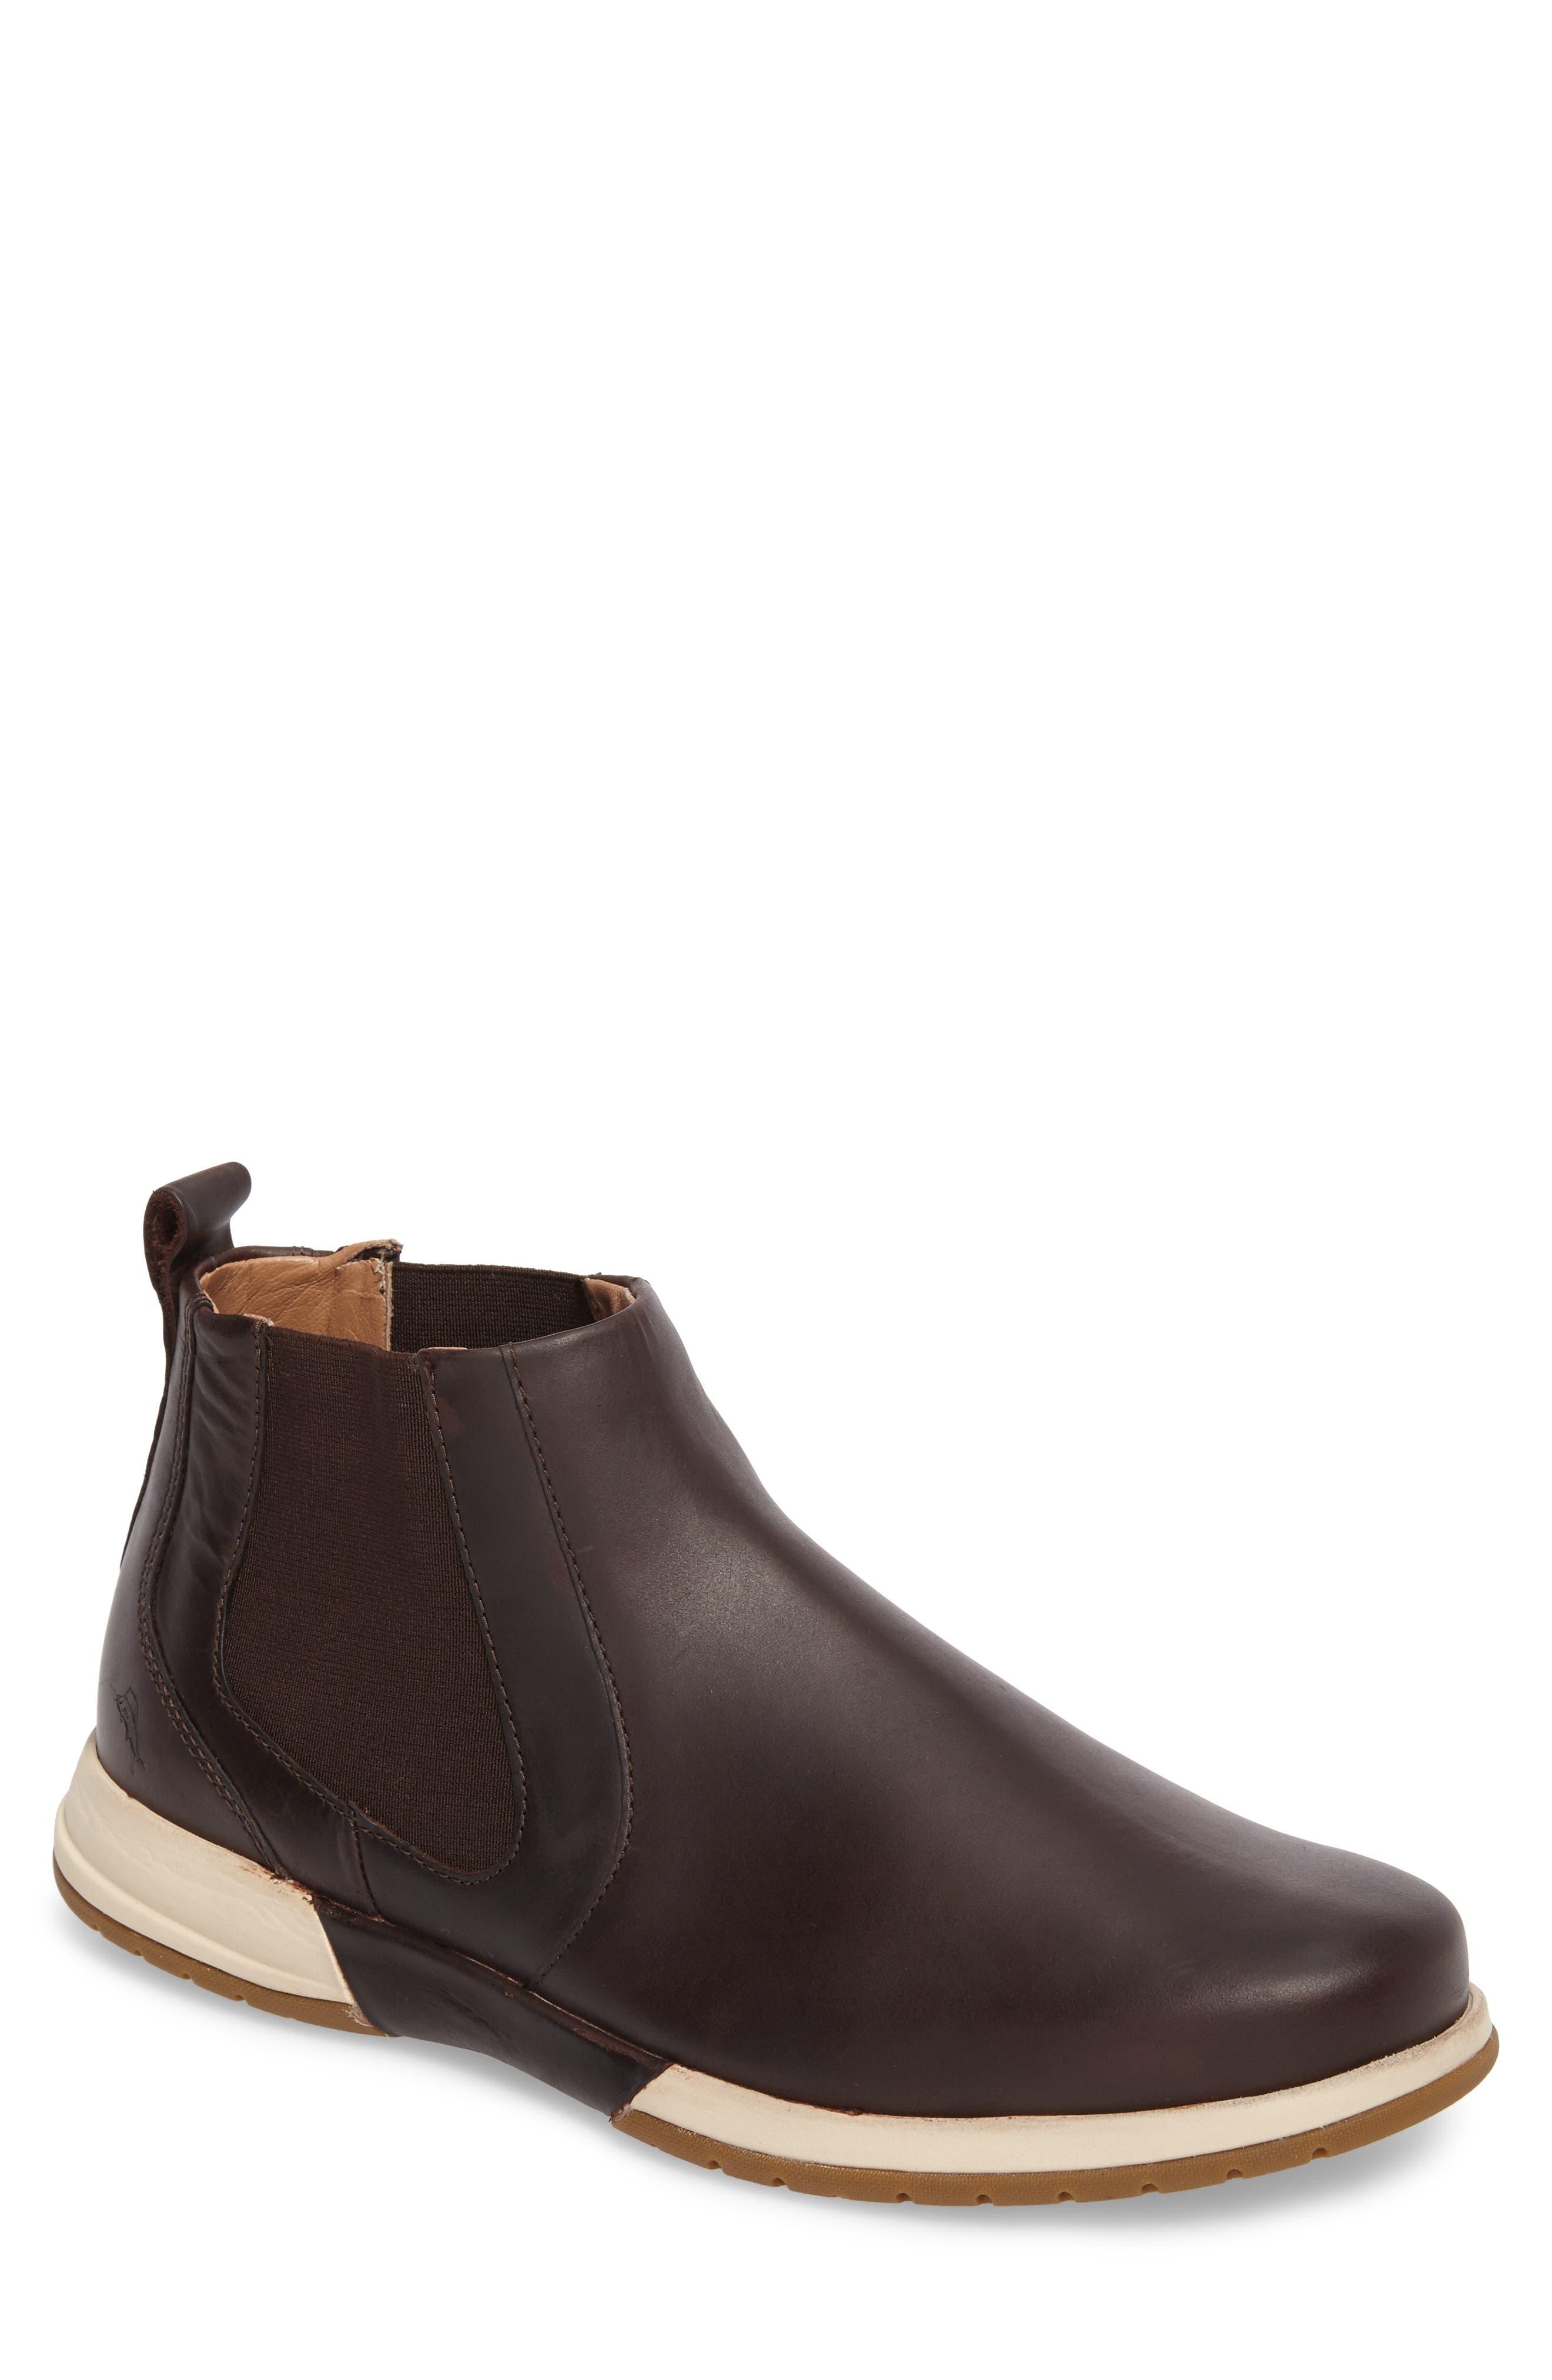 Santiago Chelsea Boot,                             Main thumbnail 1, color,                             Dark Brown Leather